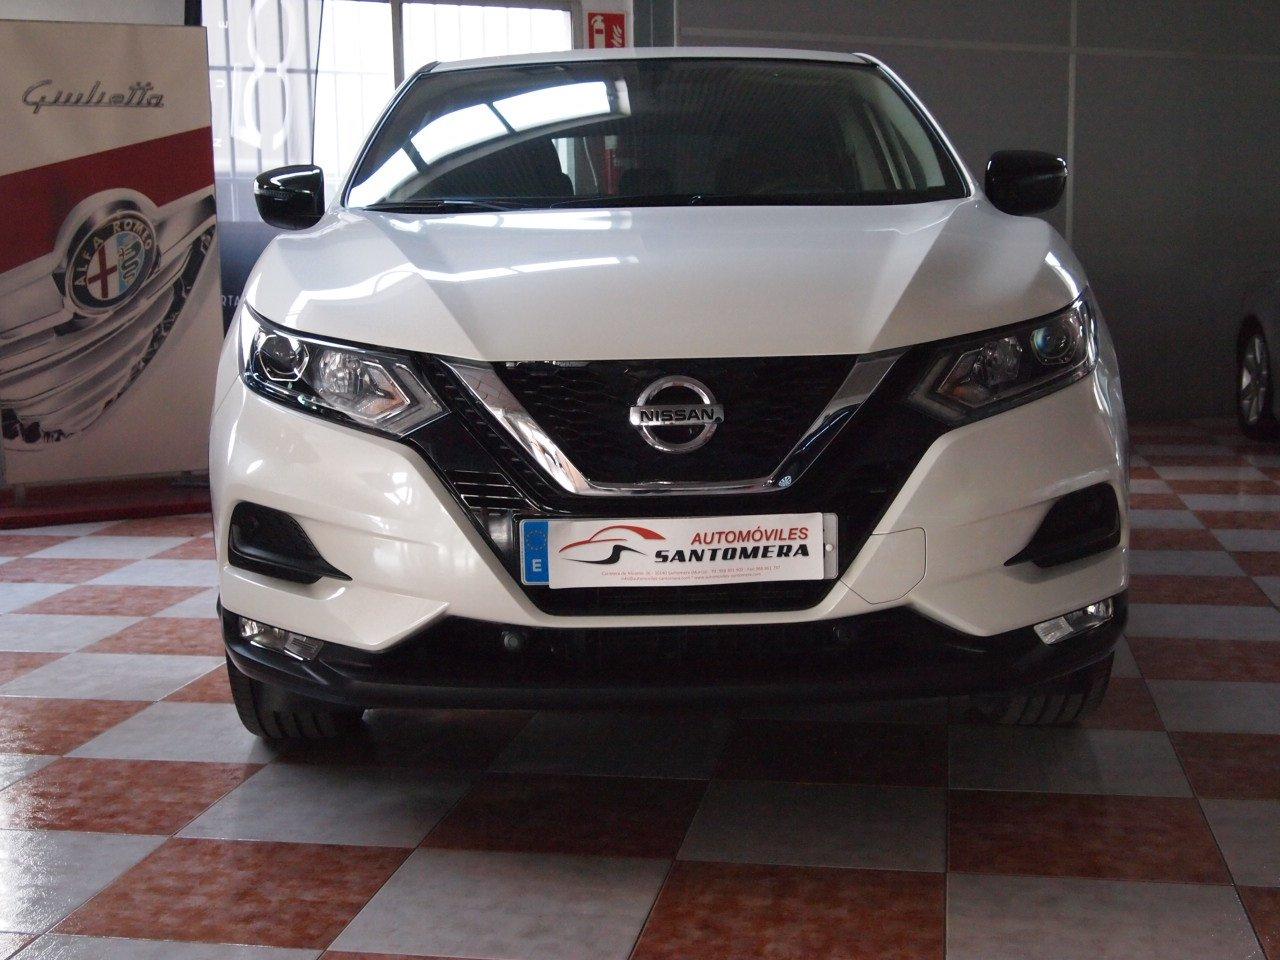 Nissan QASHQAI 1.3 dig 140CV ACENTA + NISSAN CONECT